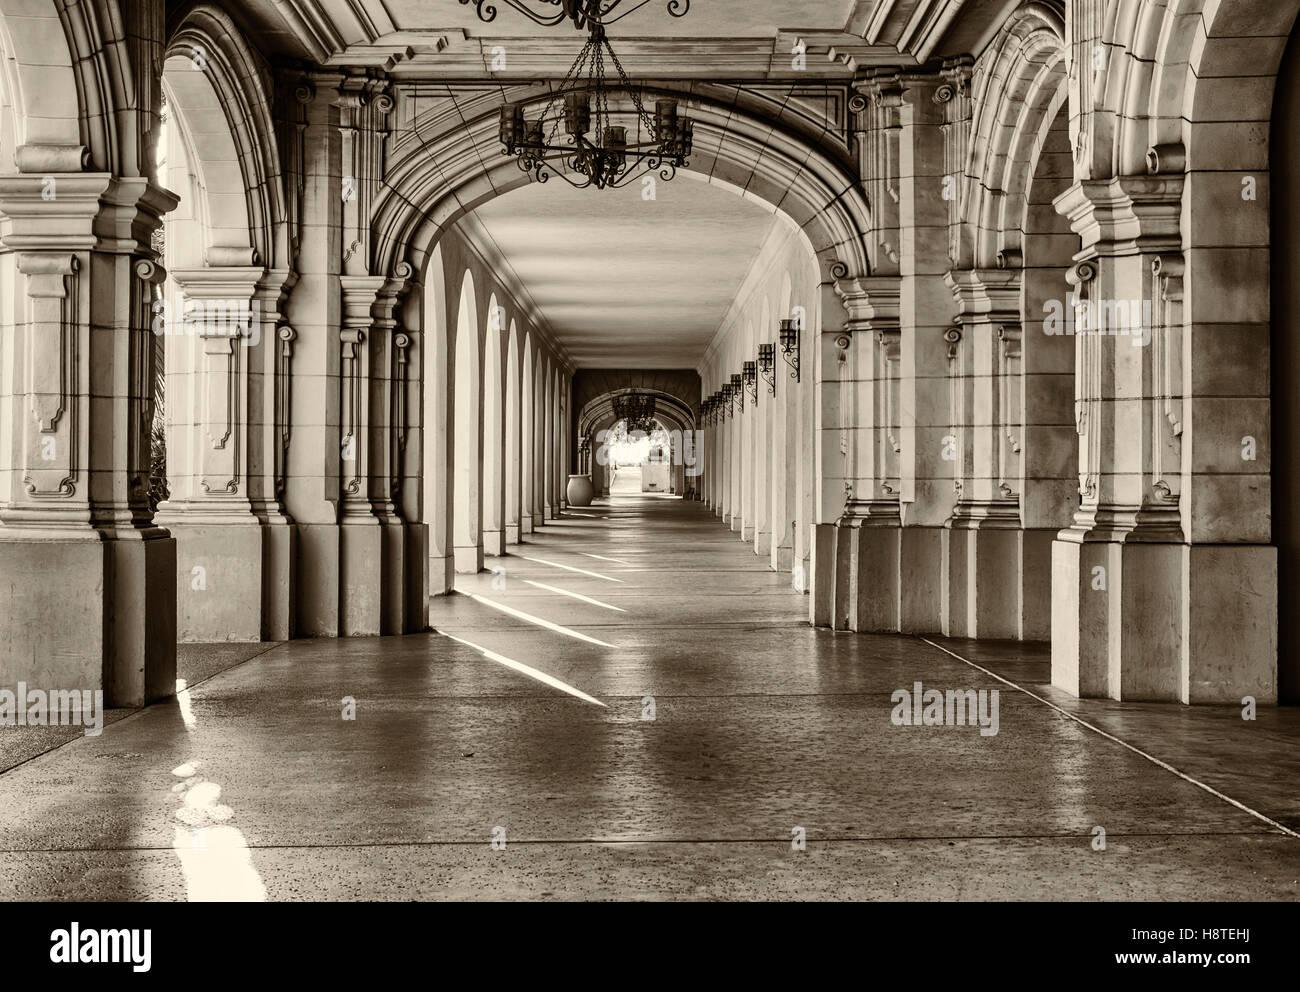 Historic architecture and walkway at Balboa Park. San Diego, California, United States. Stock Photo